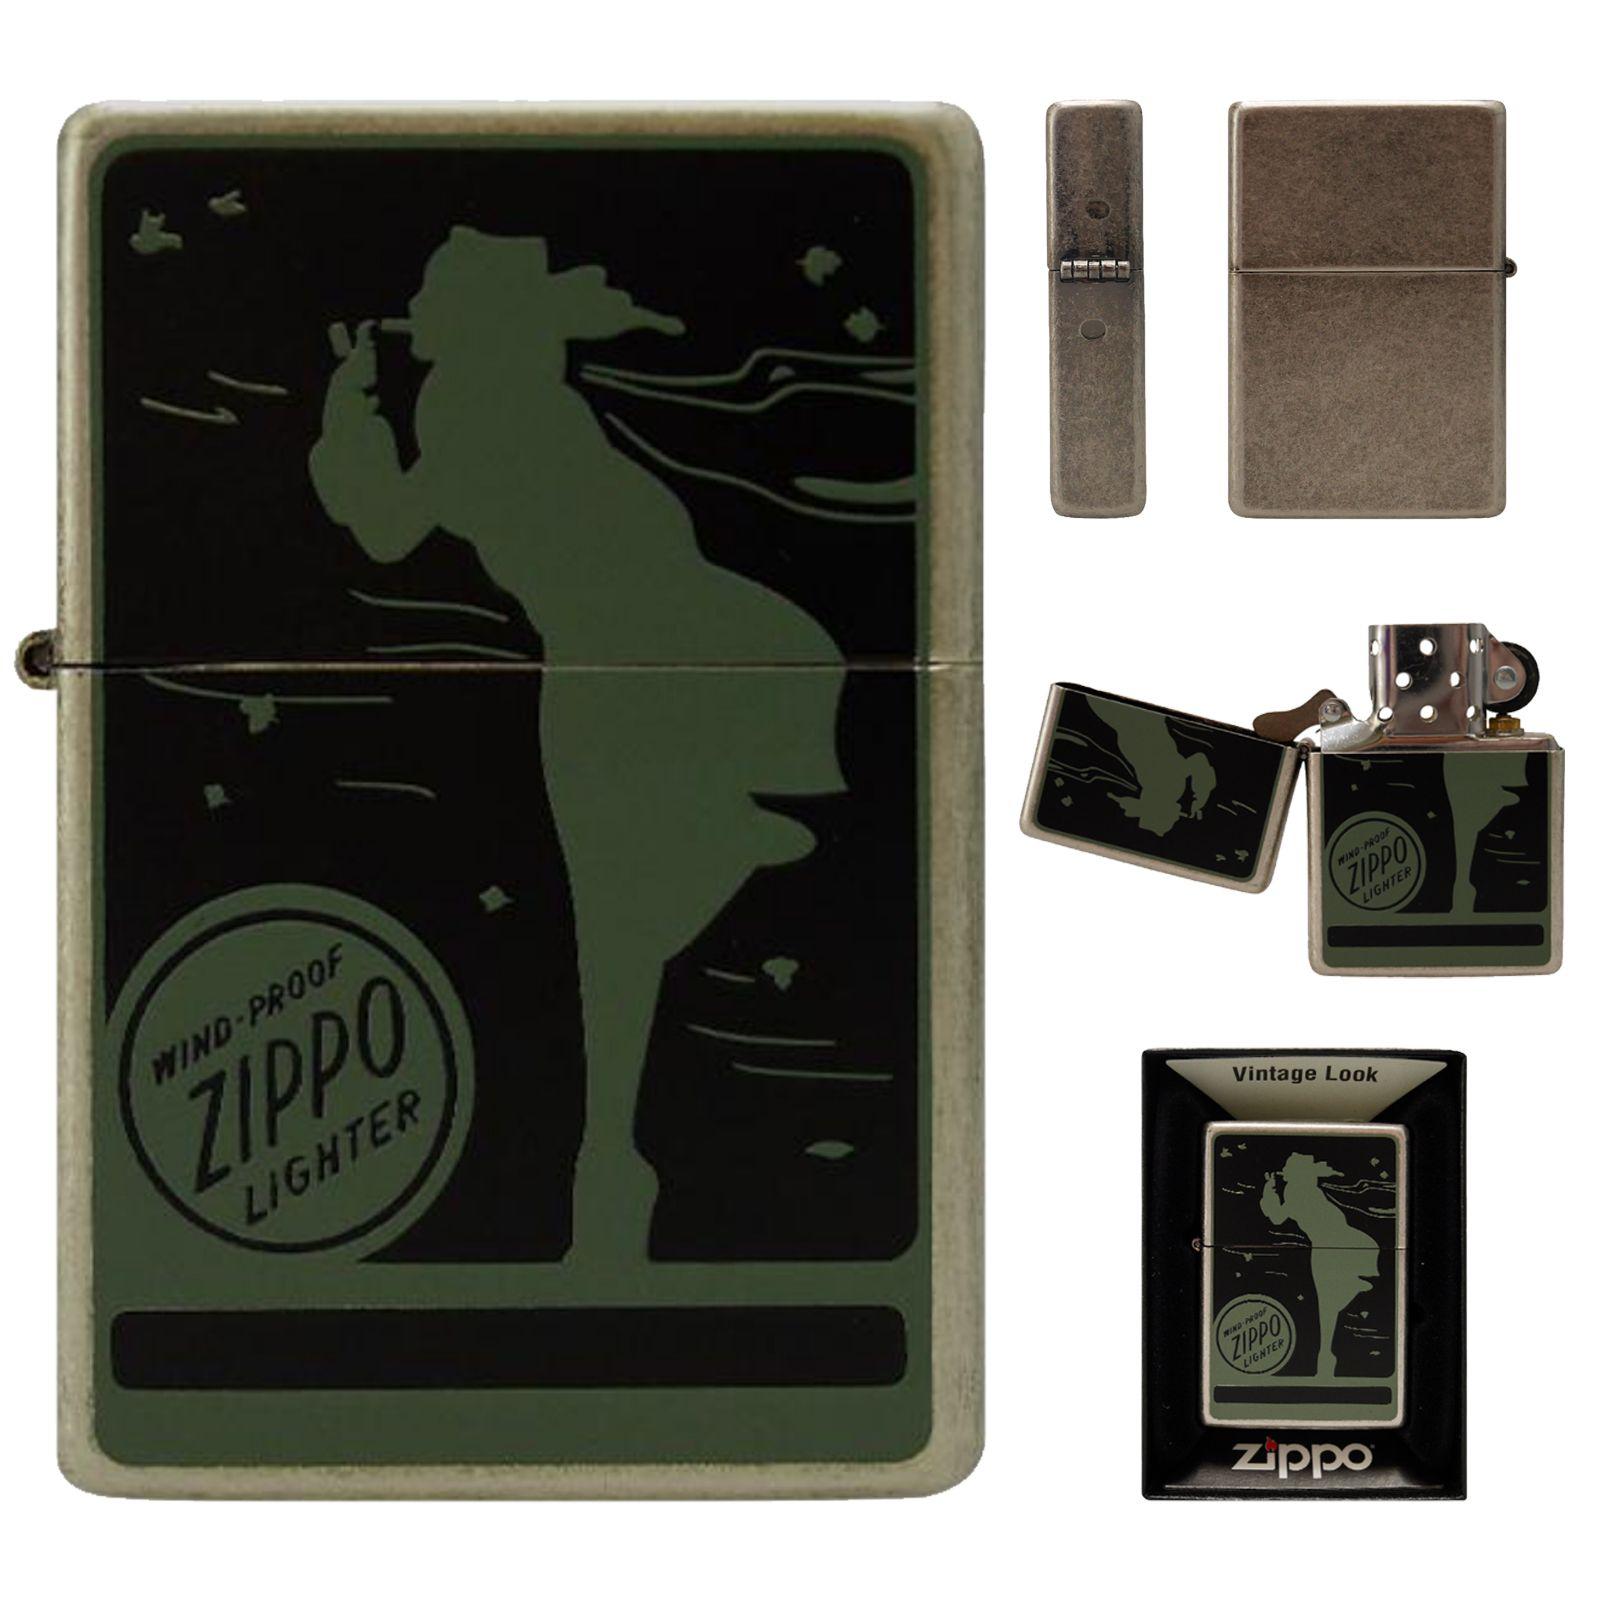 Zippo Lighter Newtro Windy Mt Silver Antique Vintage Brass Windproof Gift Ebay In 2020 Zippo Lighter Zippo Vintage Brass